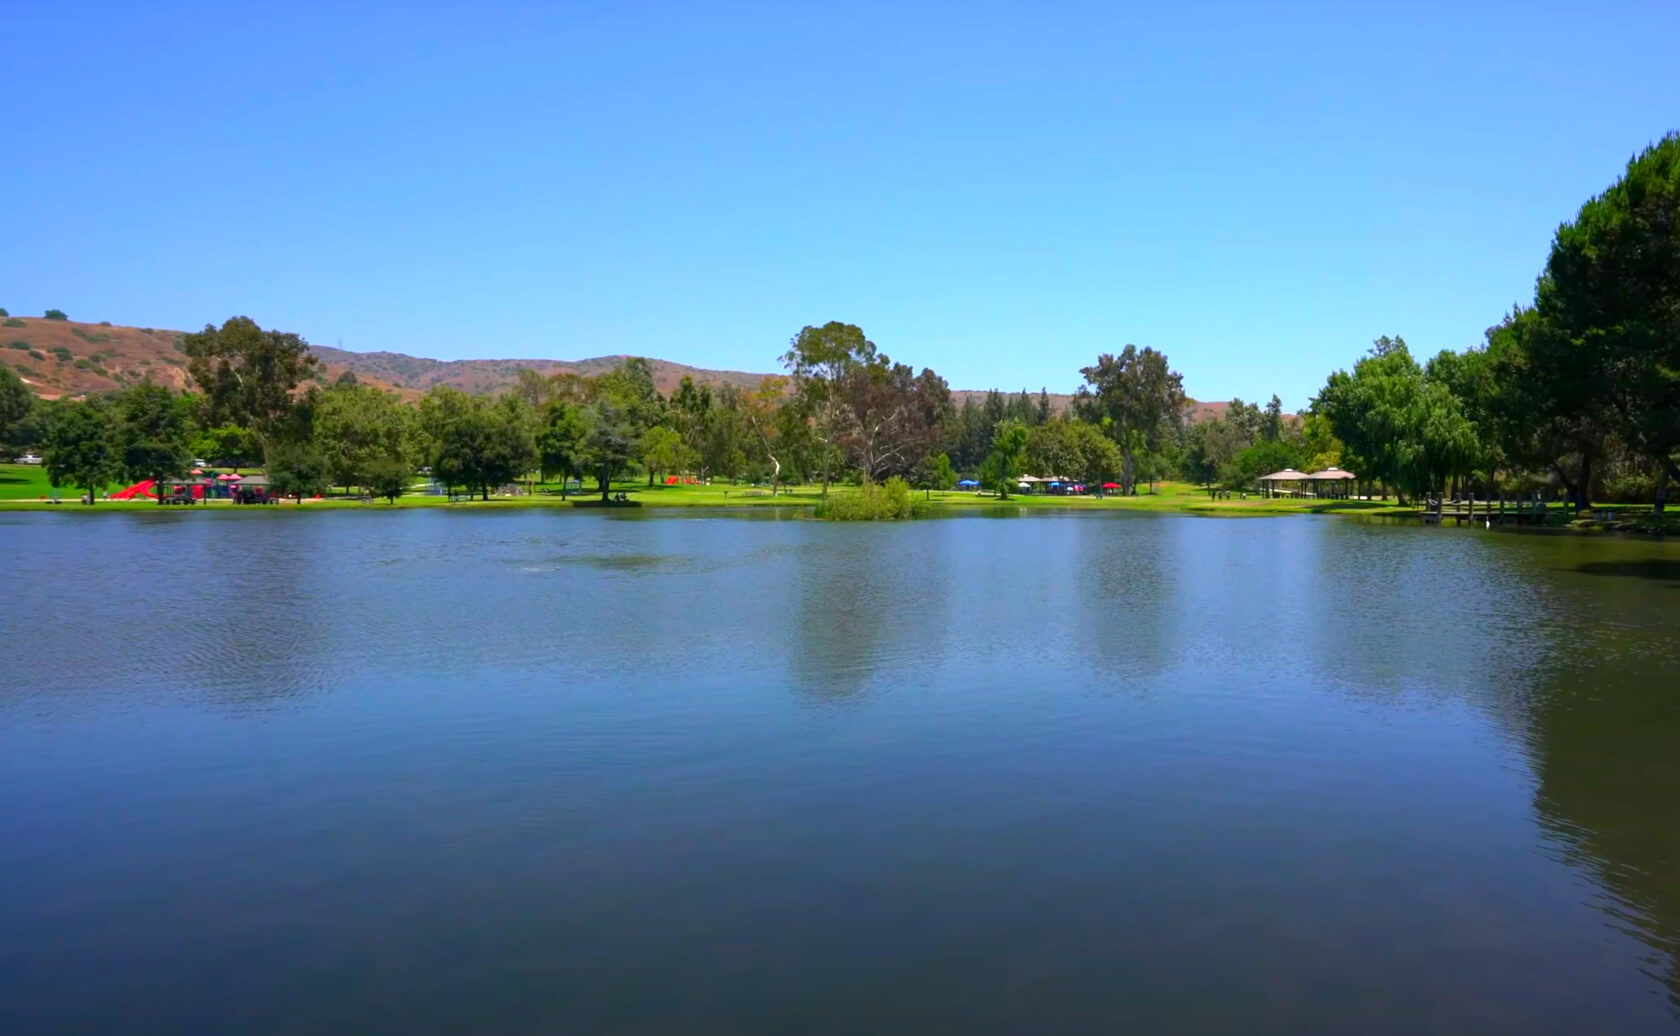 Carbon-Canyon-Park-Lake-Fishing-Guide-Report-Brea-CA-06